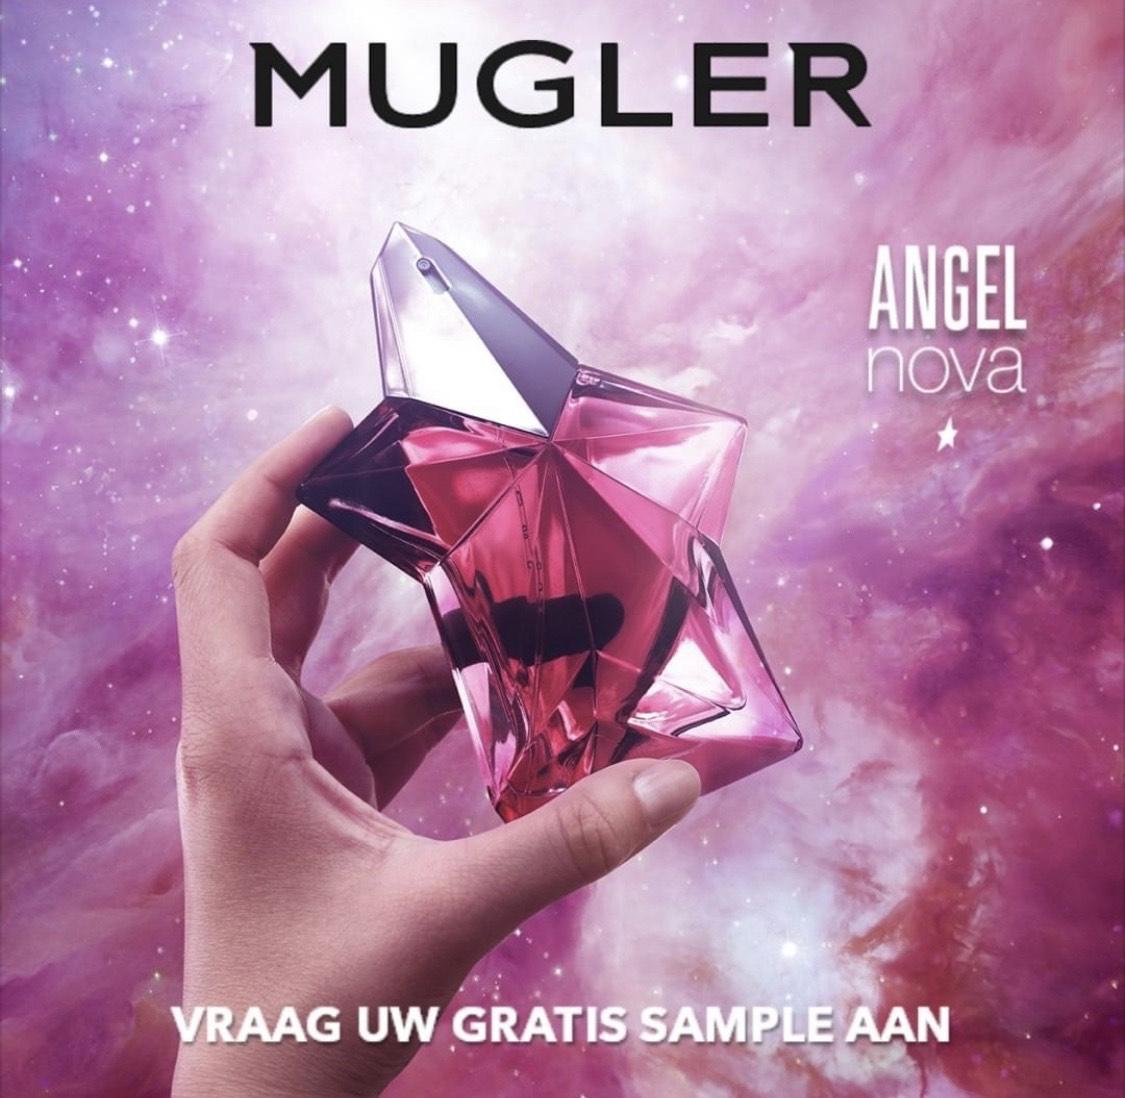 Gratis Thierry Mugler Angel-Nova parfum sample